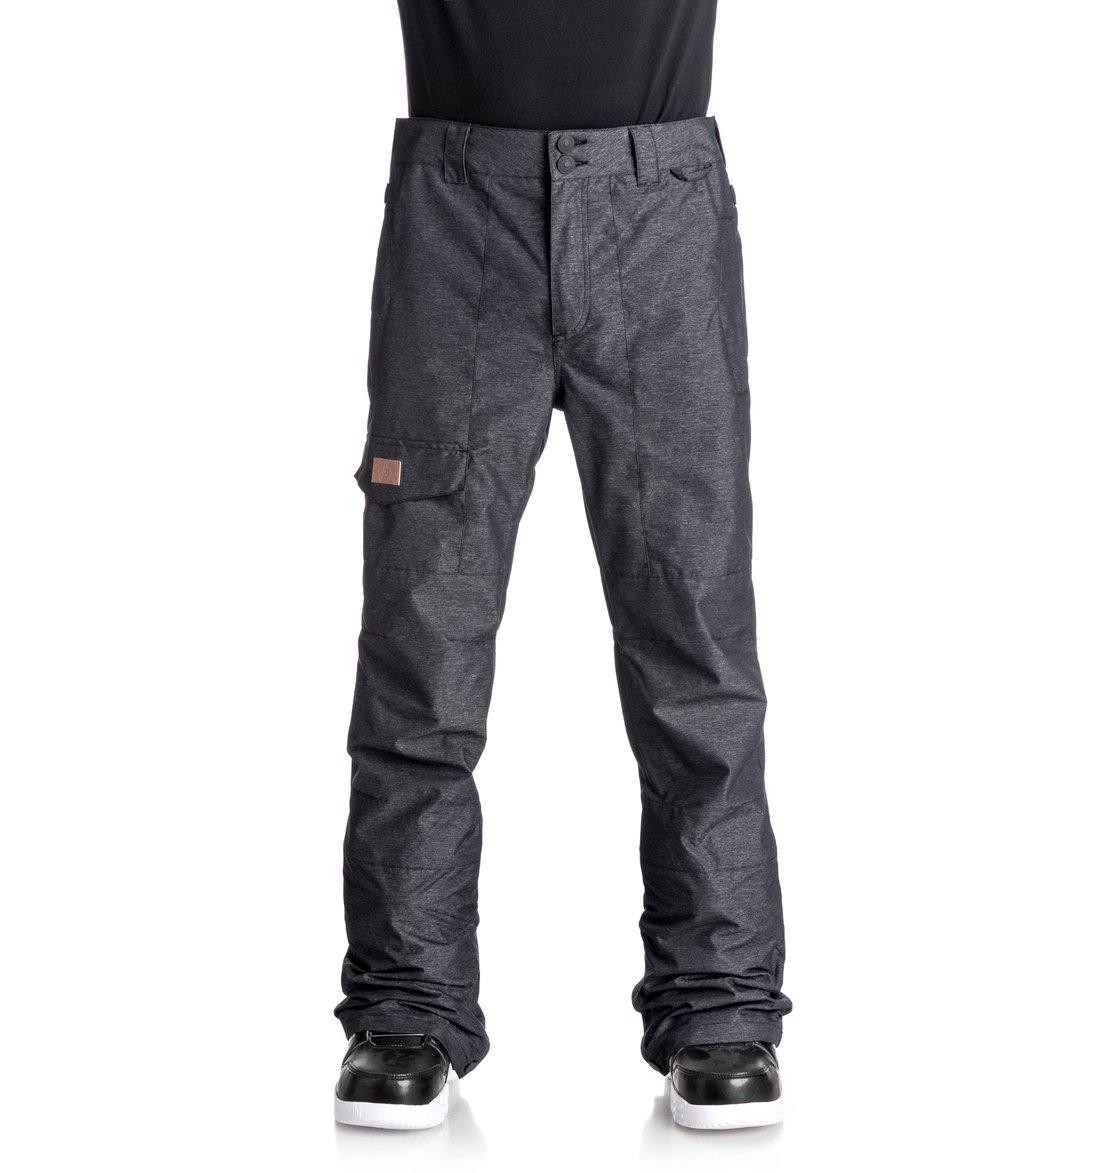 Dealer Pantalones Para Nieve Para Hombre 888327883045 Dc Shoes